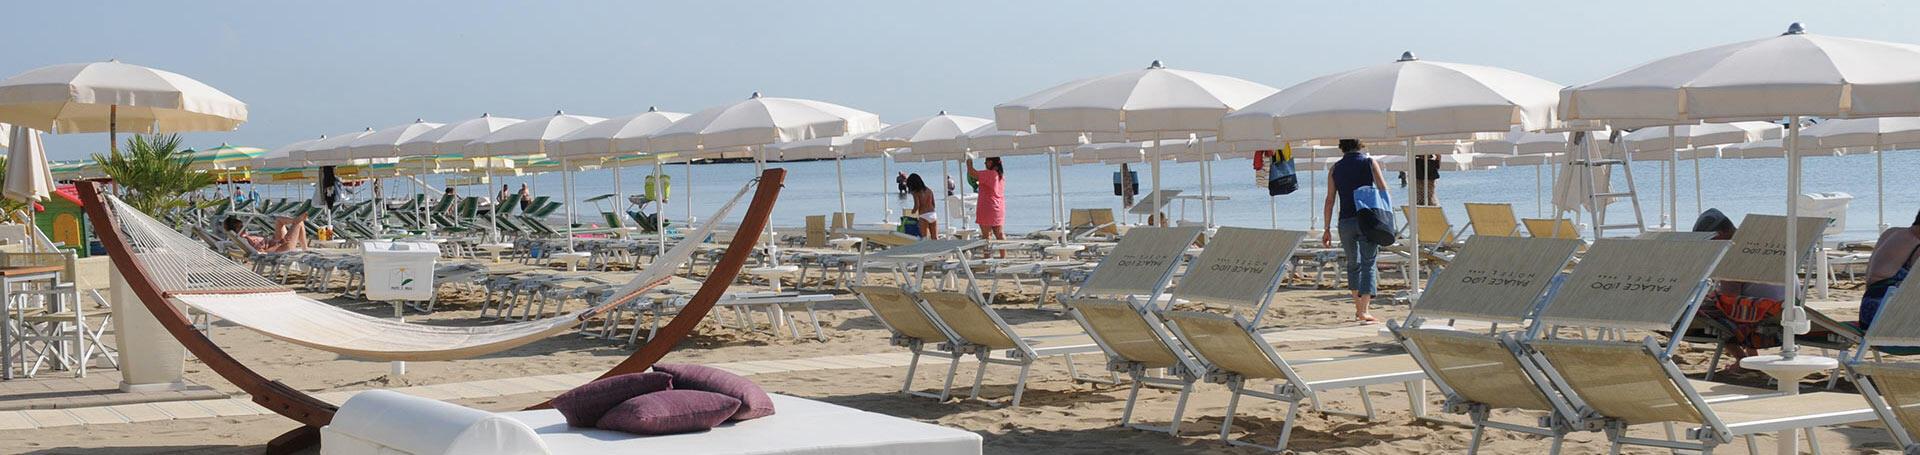 palacelidohotel en private-beach-lido-di-savio 009